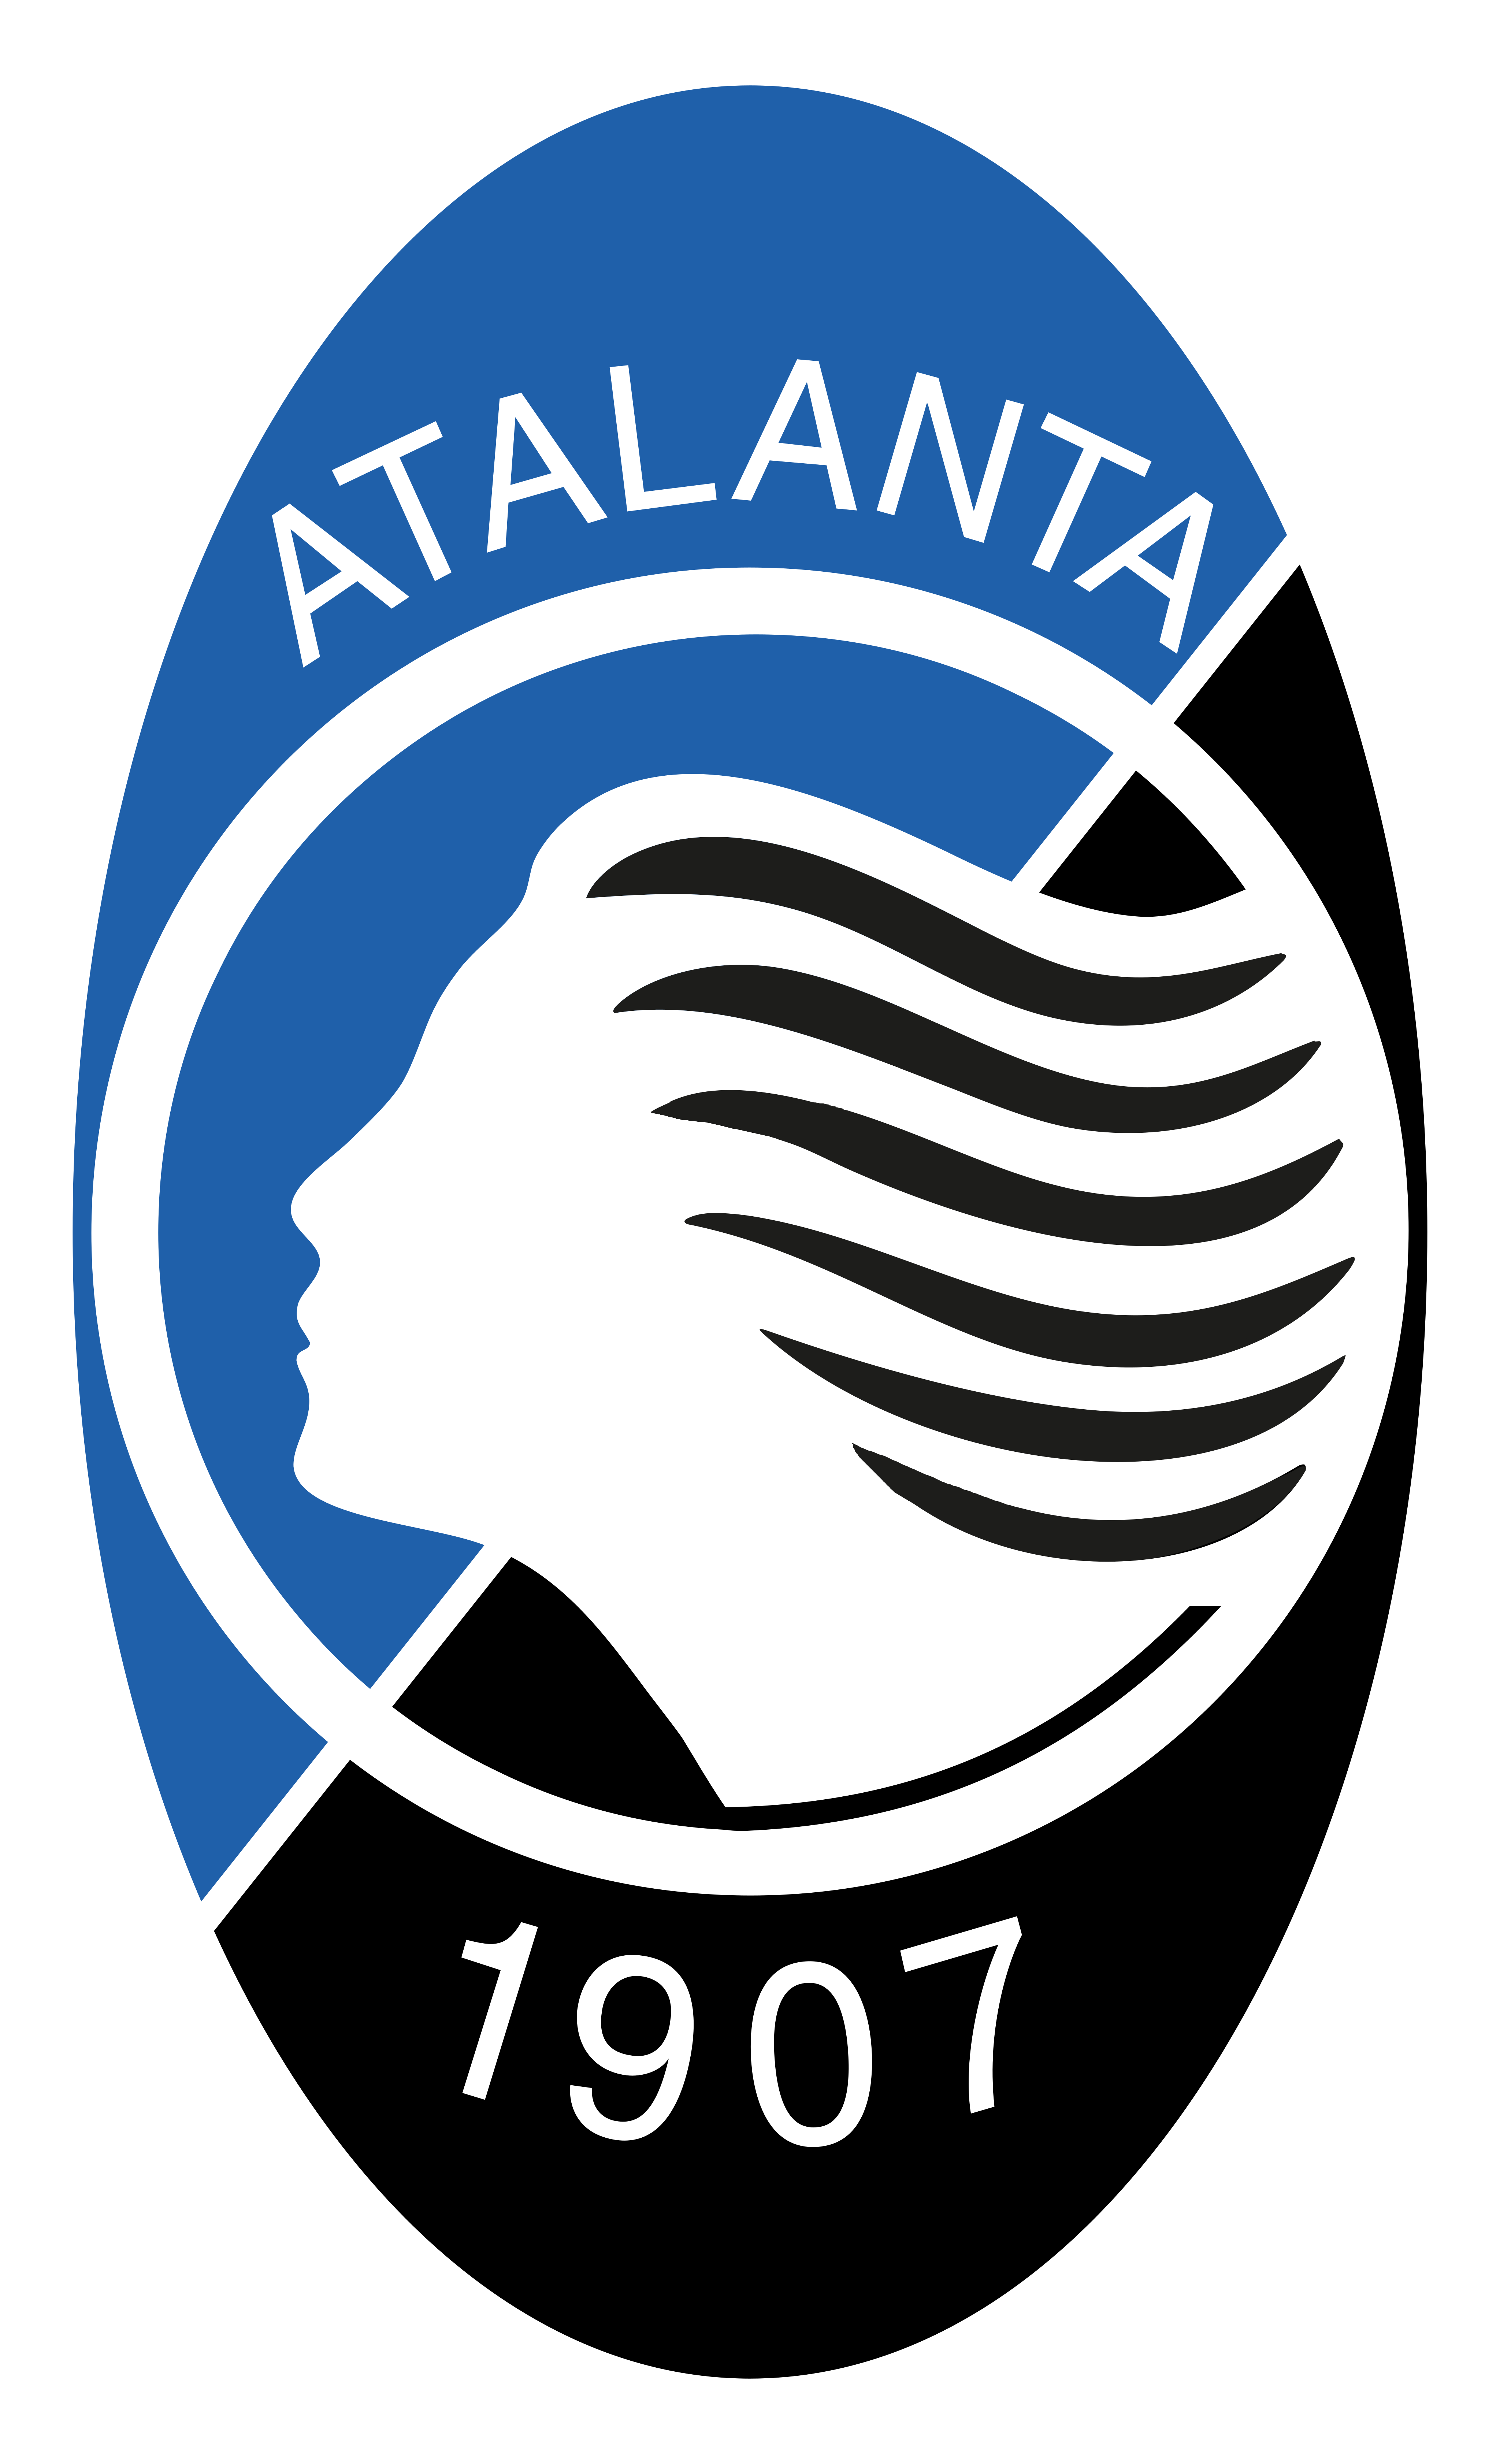 atalanta logo - Atalanta BC Logo - Escudo